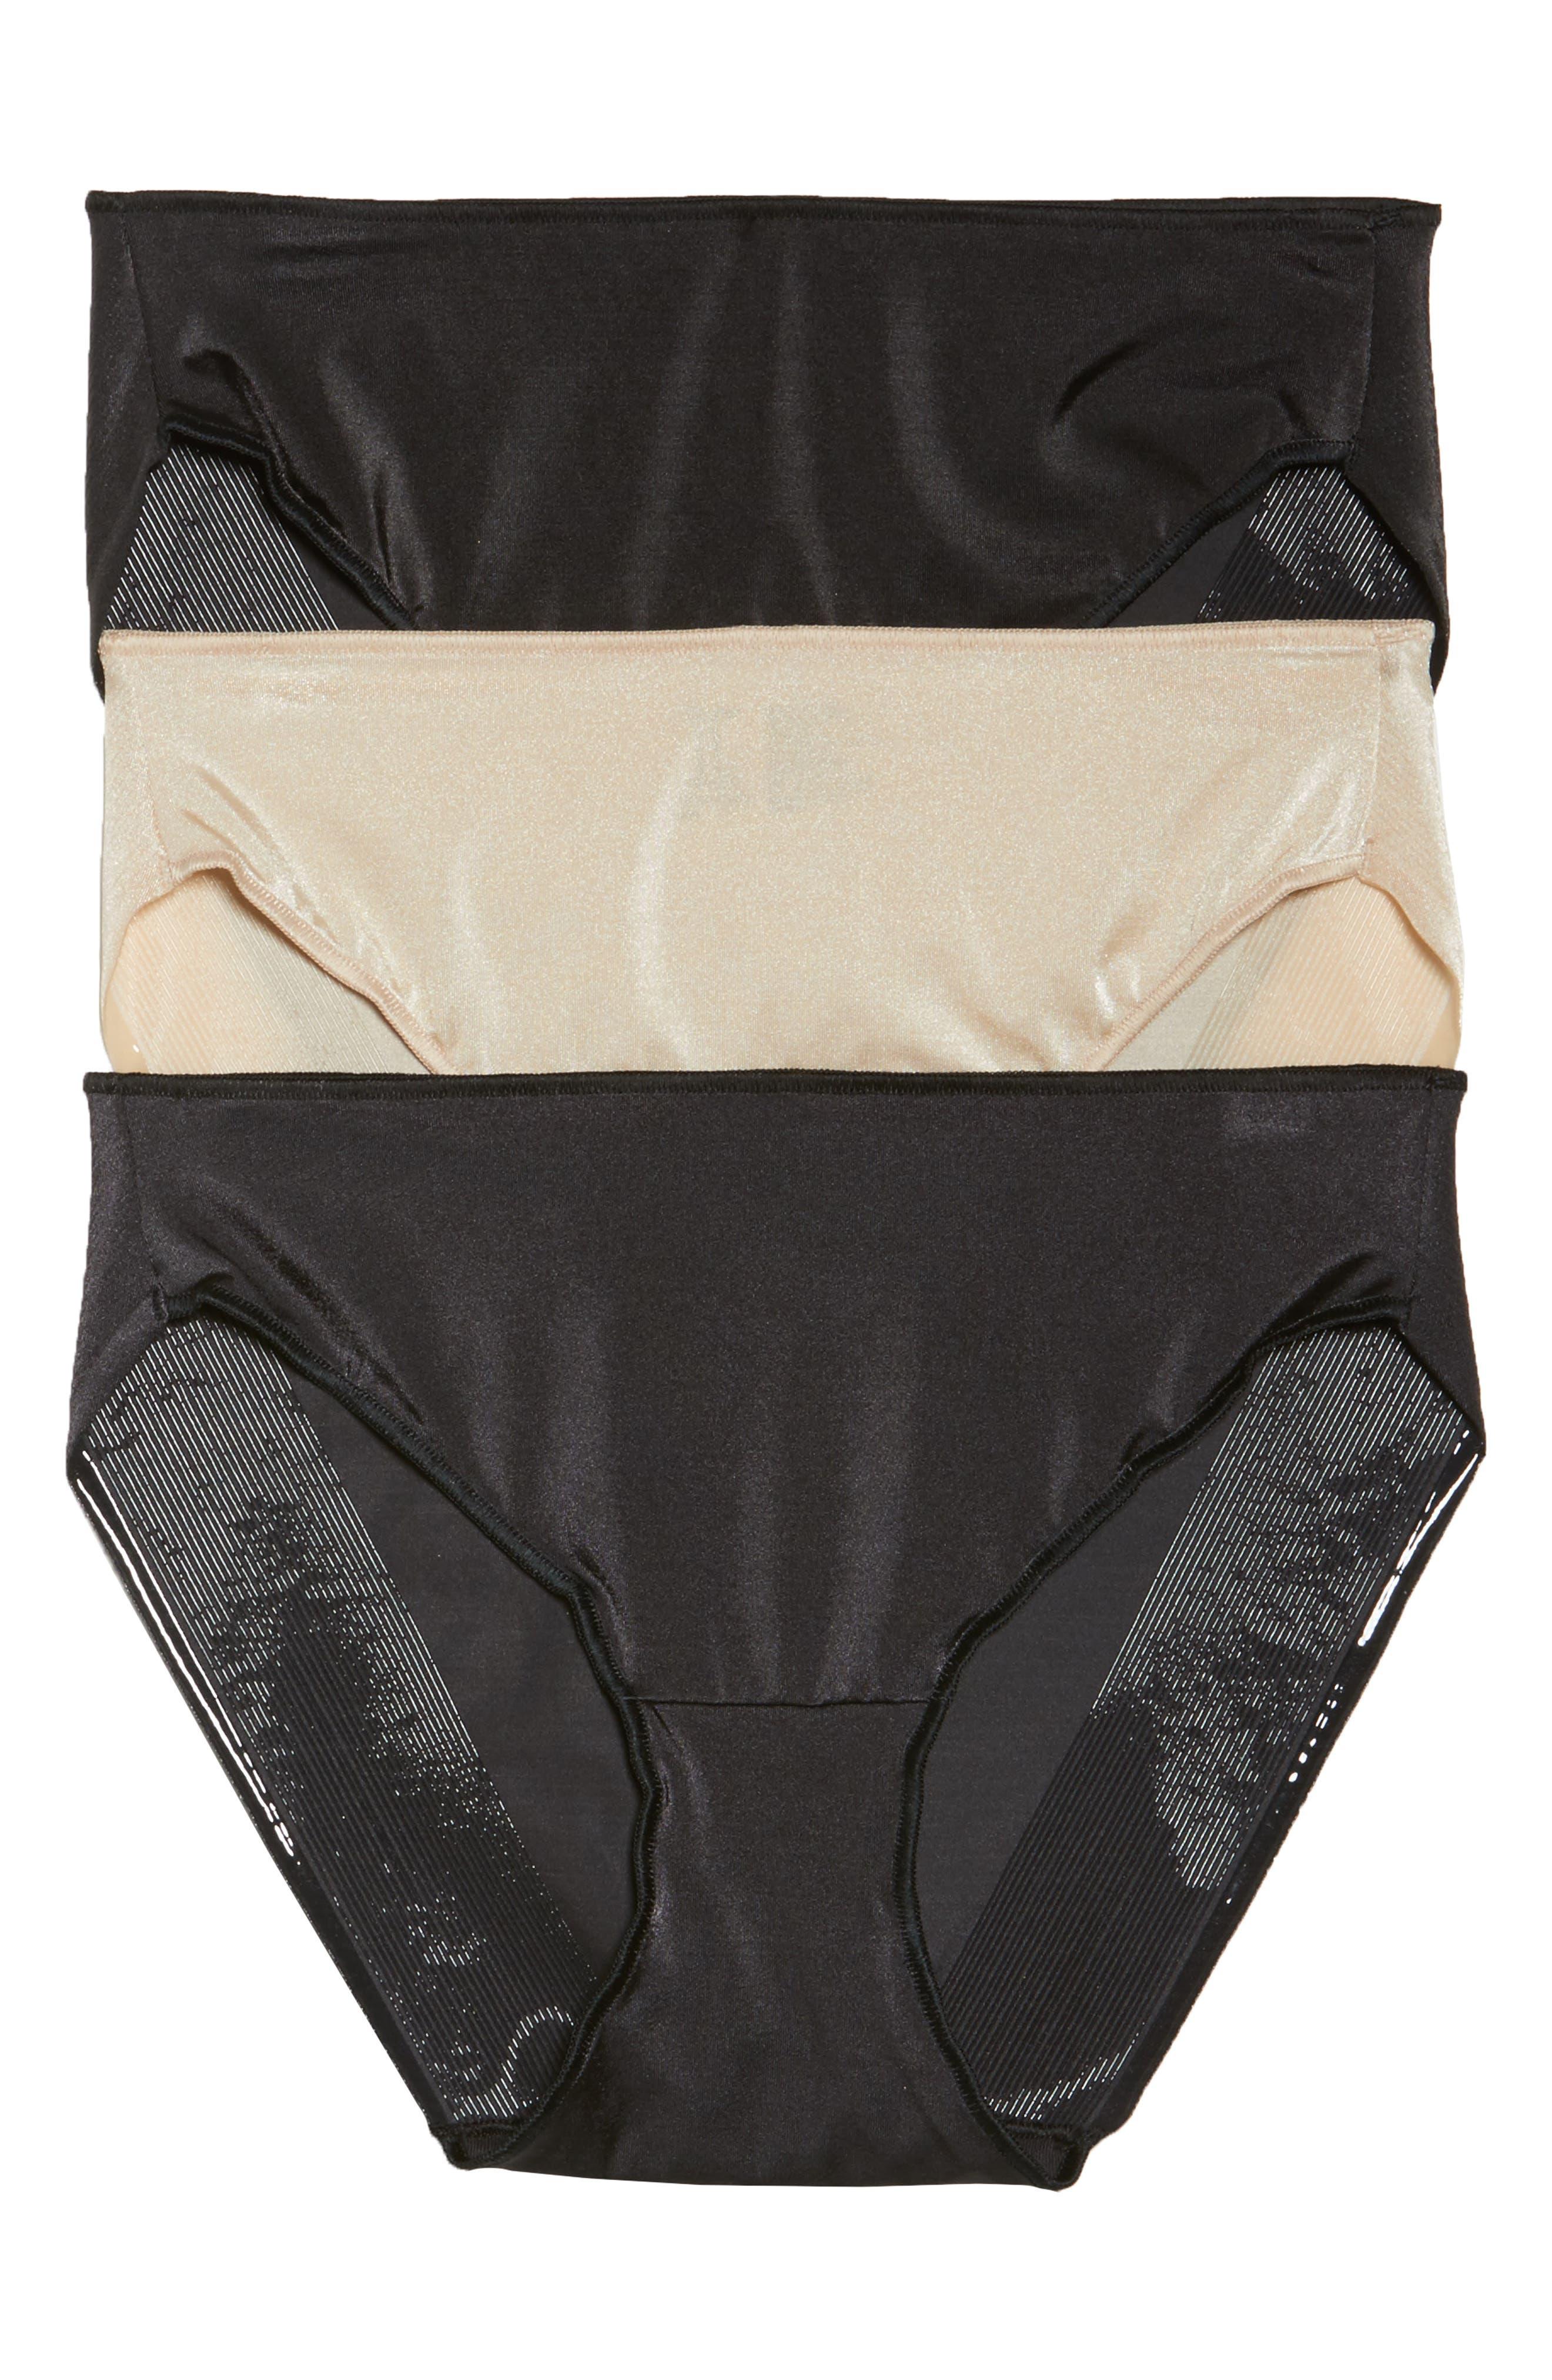 3-Pack Hipster Panties,                             Main thumbnail 1, color,                             BLACK/ NUDE